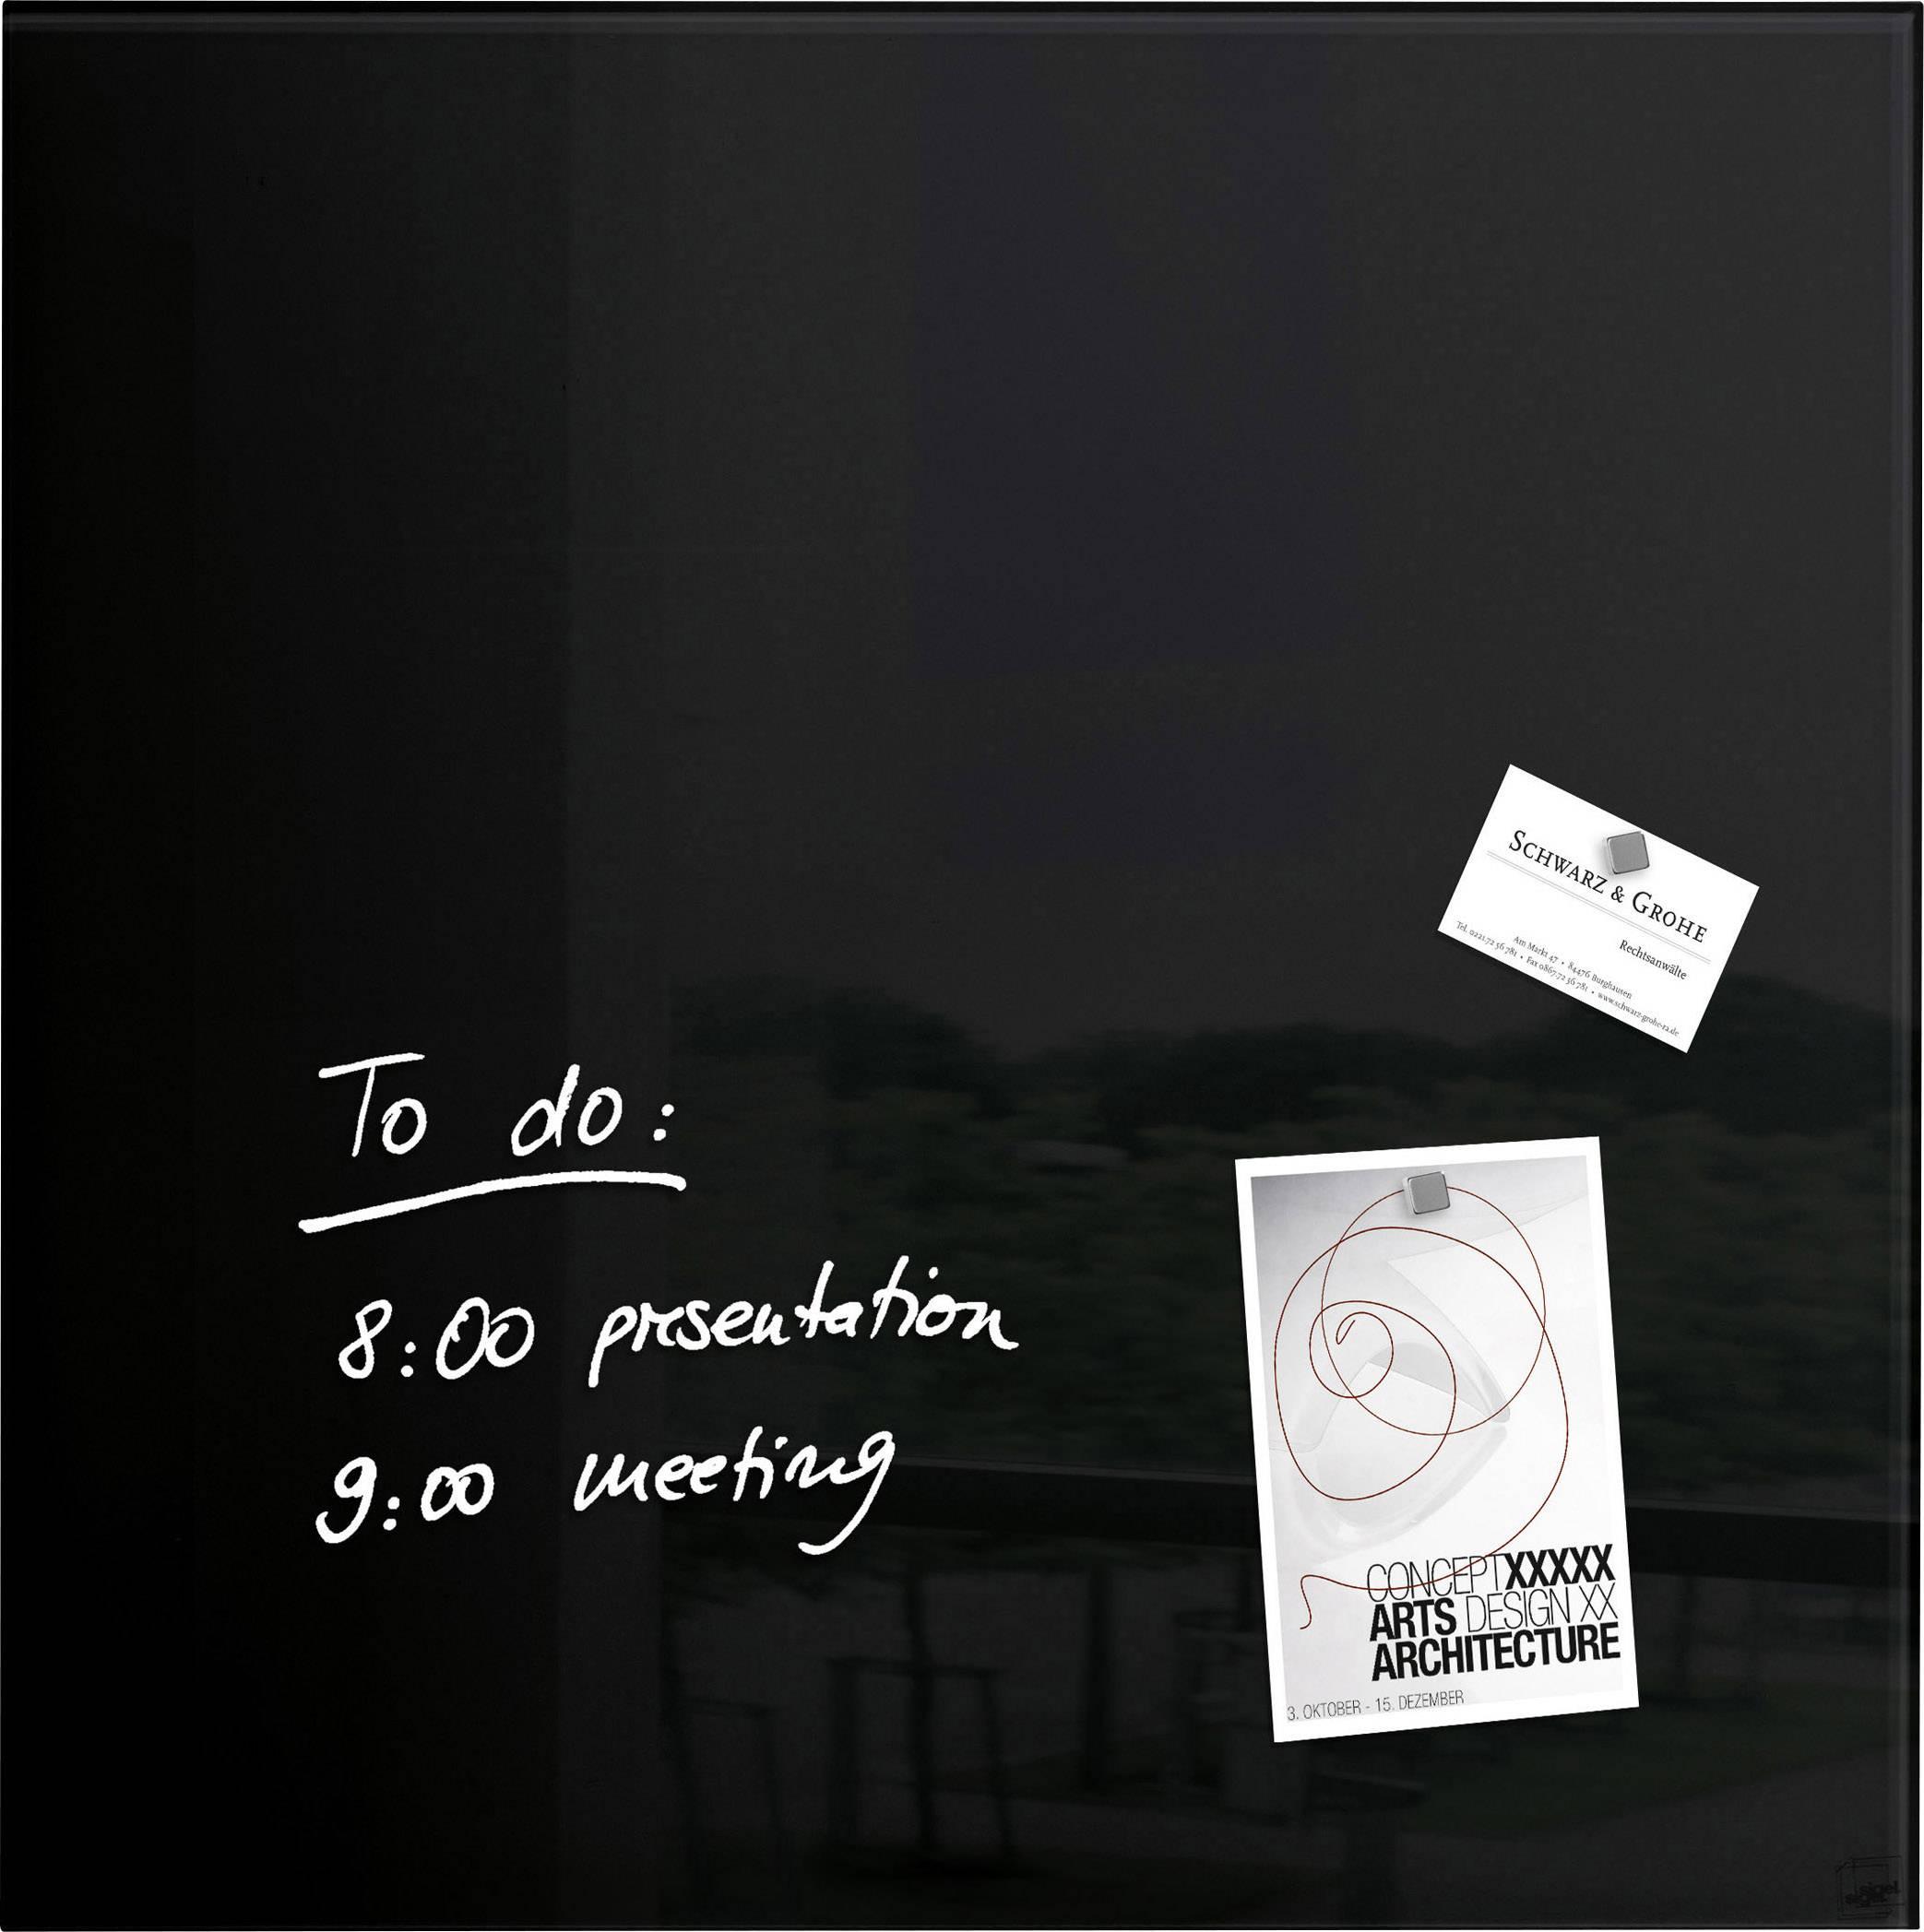 17 cm Acryl glasklar Artverum SIGEL GL199 Stifteschale f/ür Boards weitere Gr/ö/ße